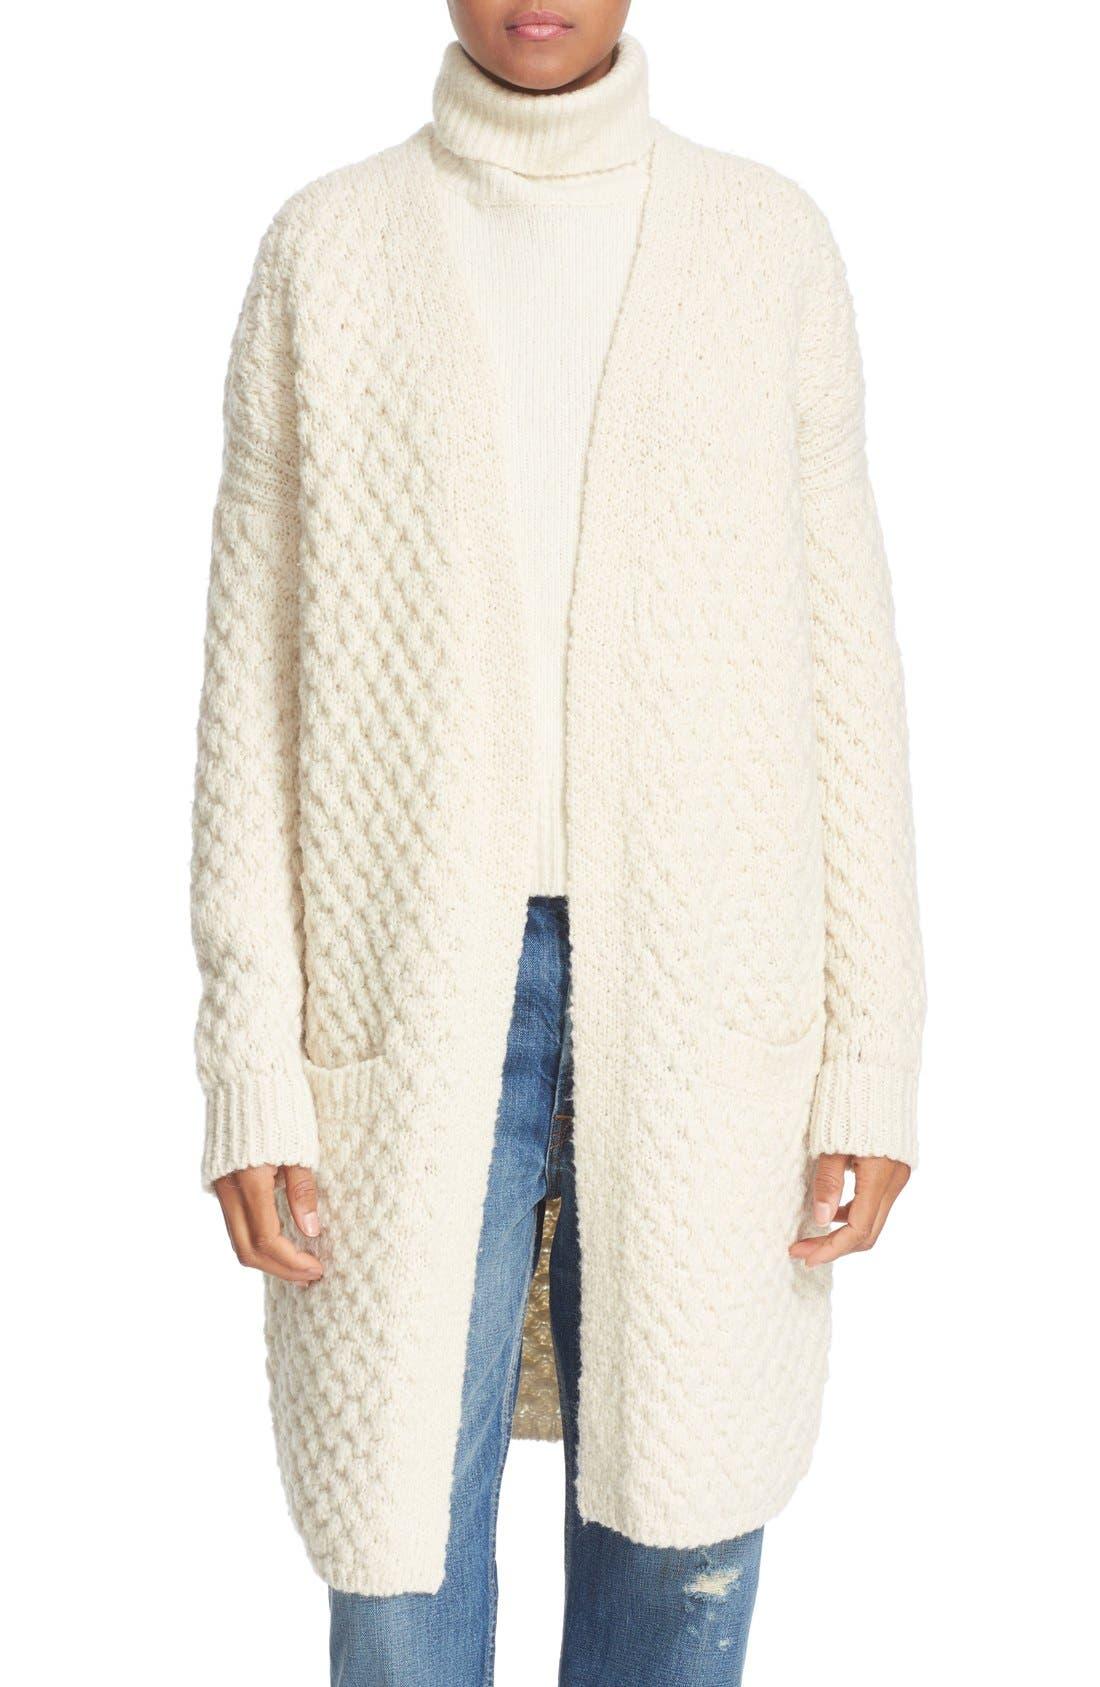 Alternate Image 1 Selected - Vince Honeycomb Wool Blend Long Cardigan